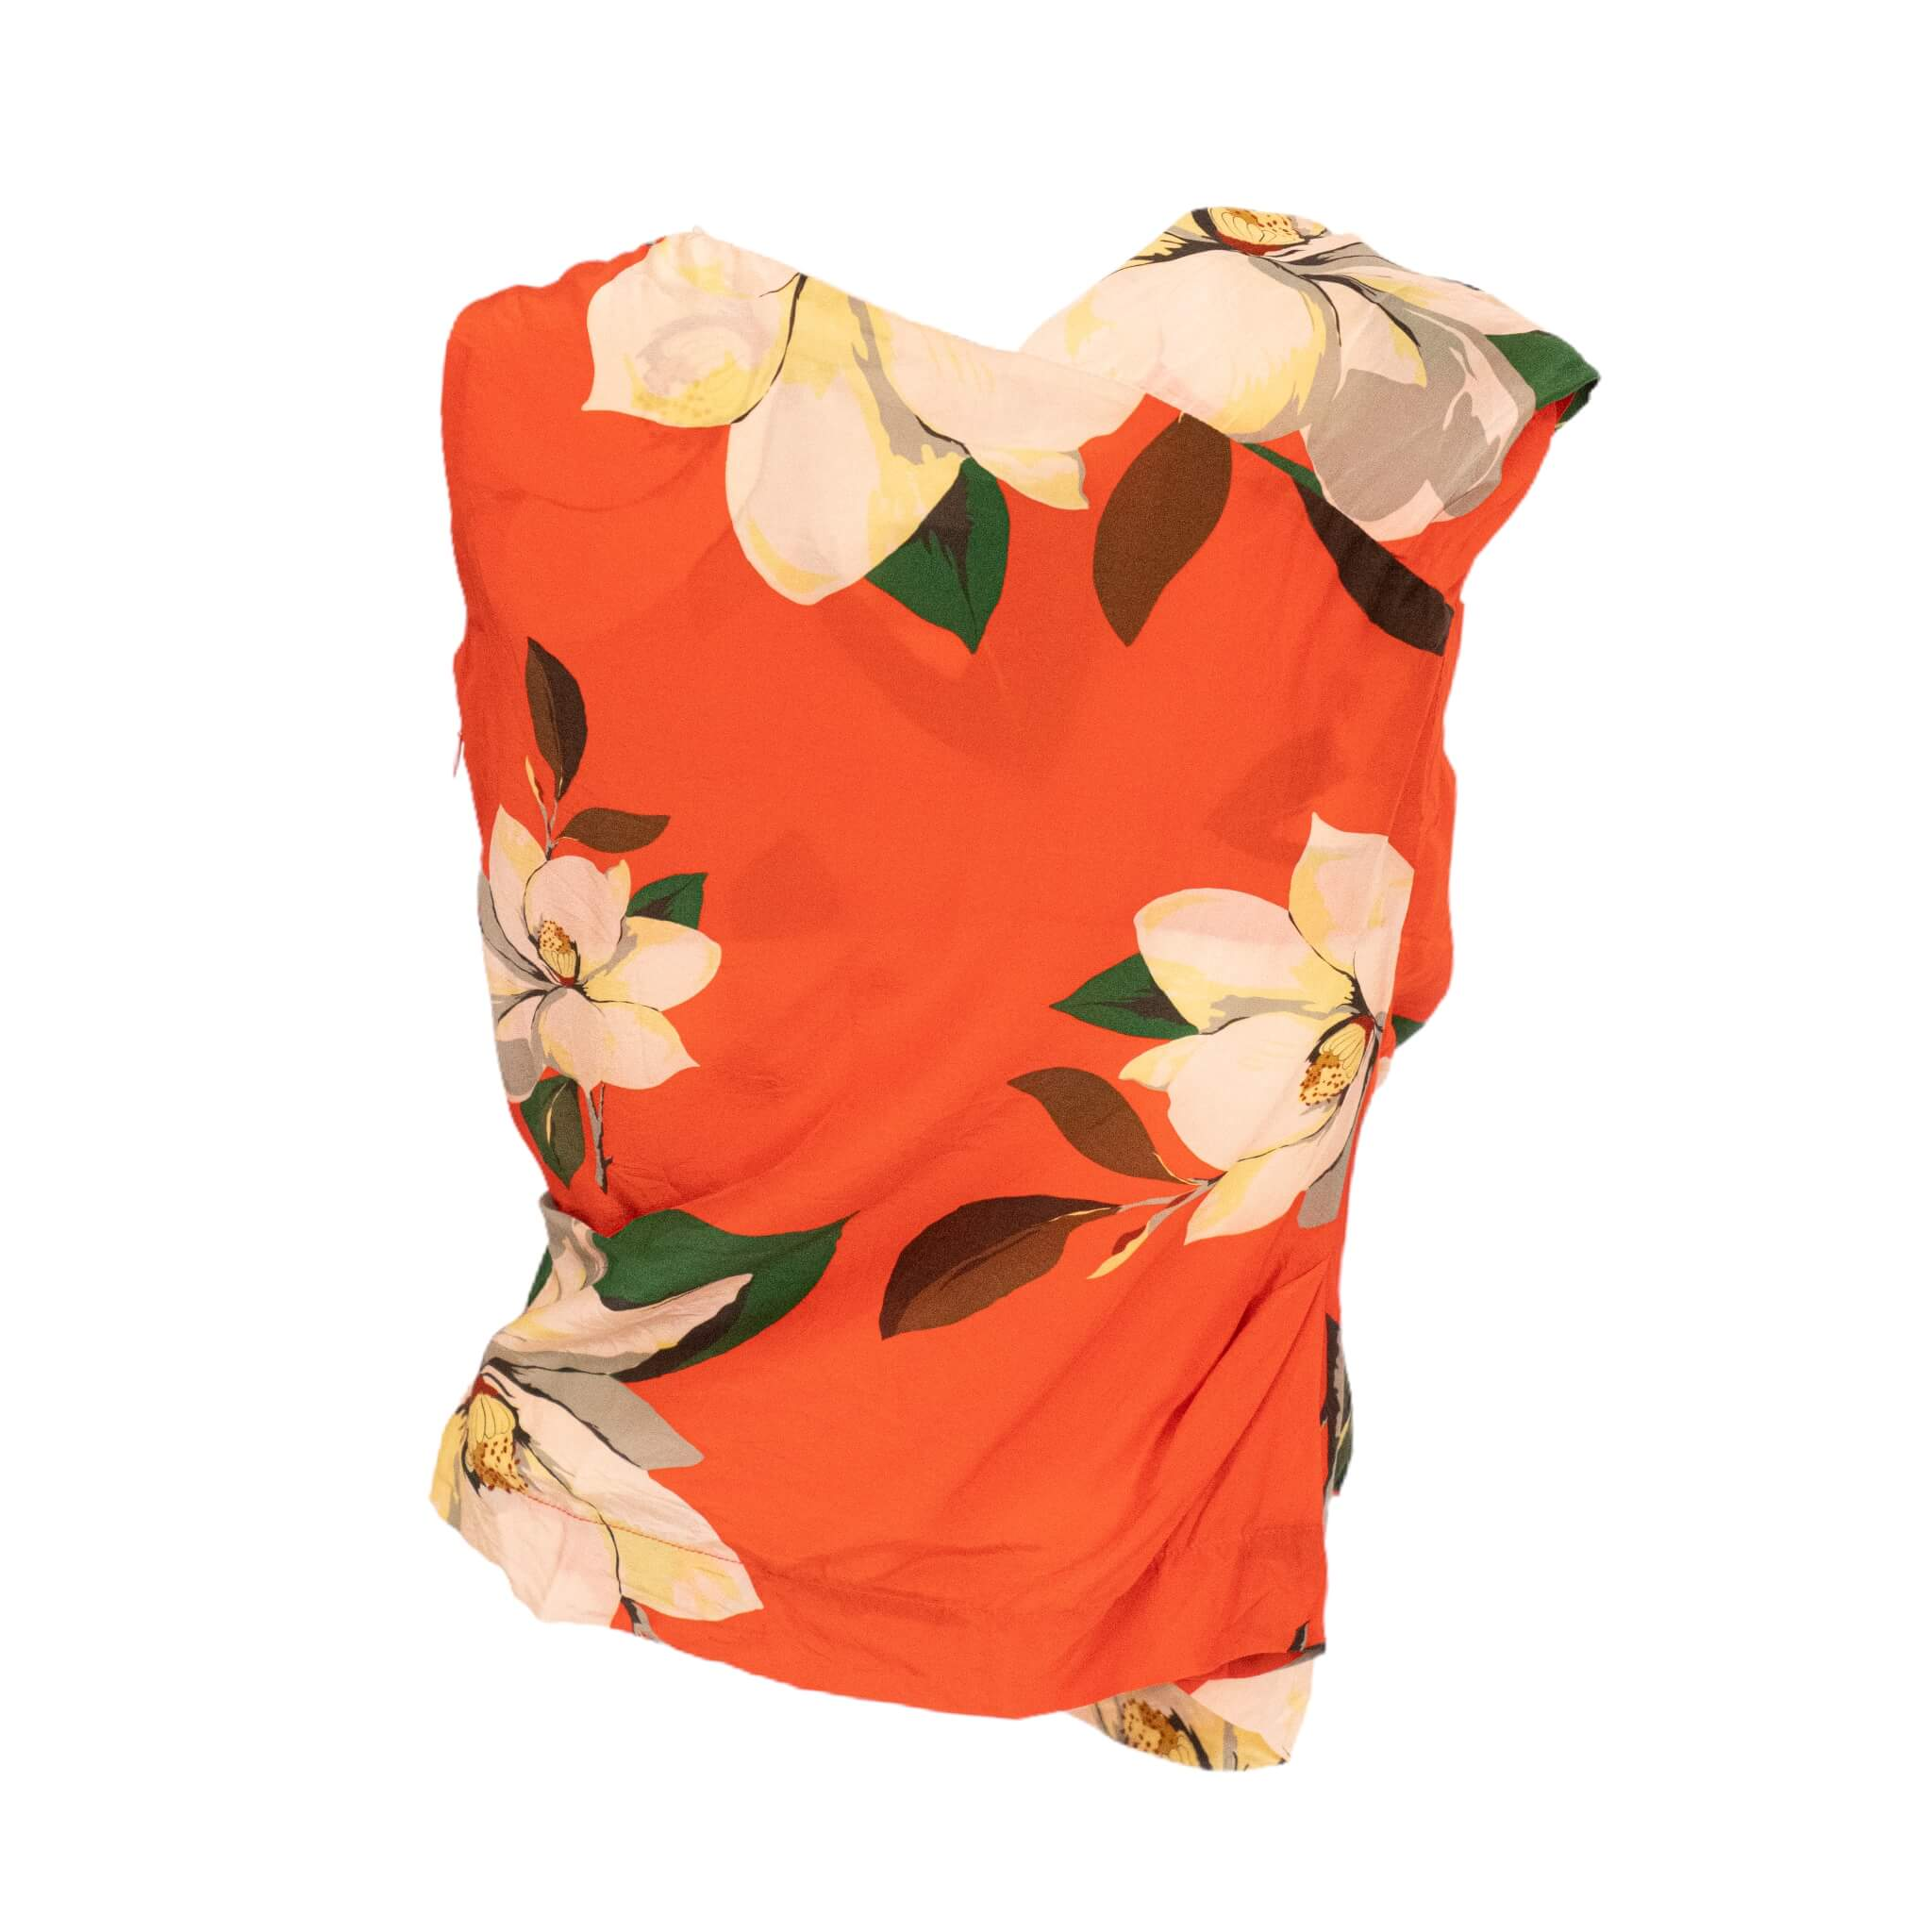 Vivienne Westwood Dream Boat Shirt